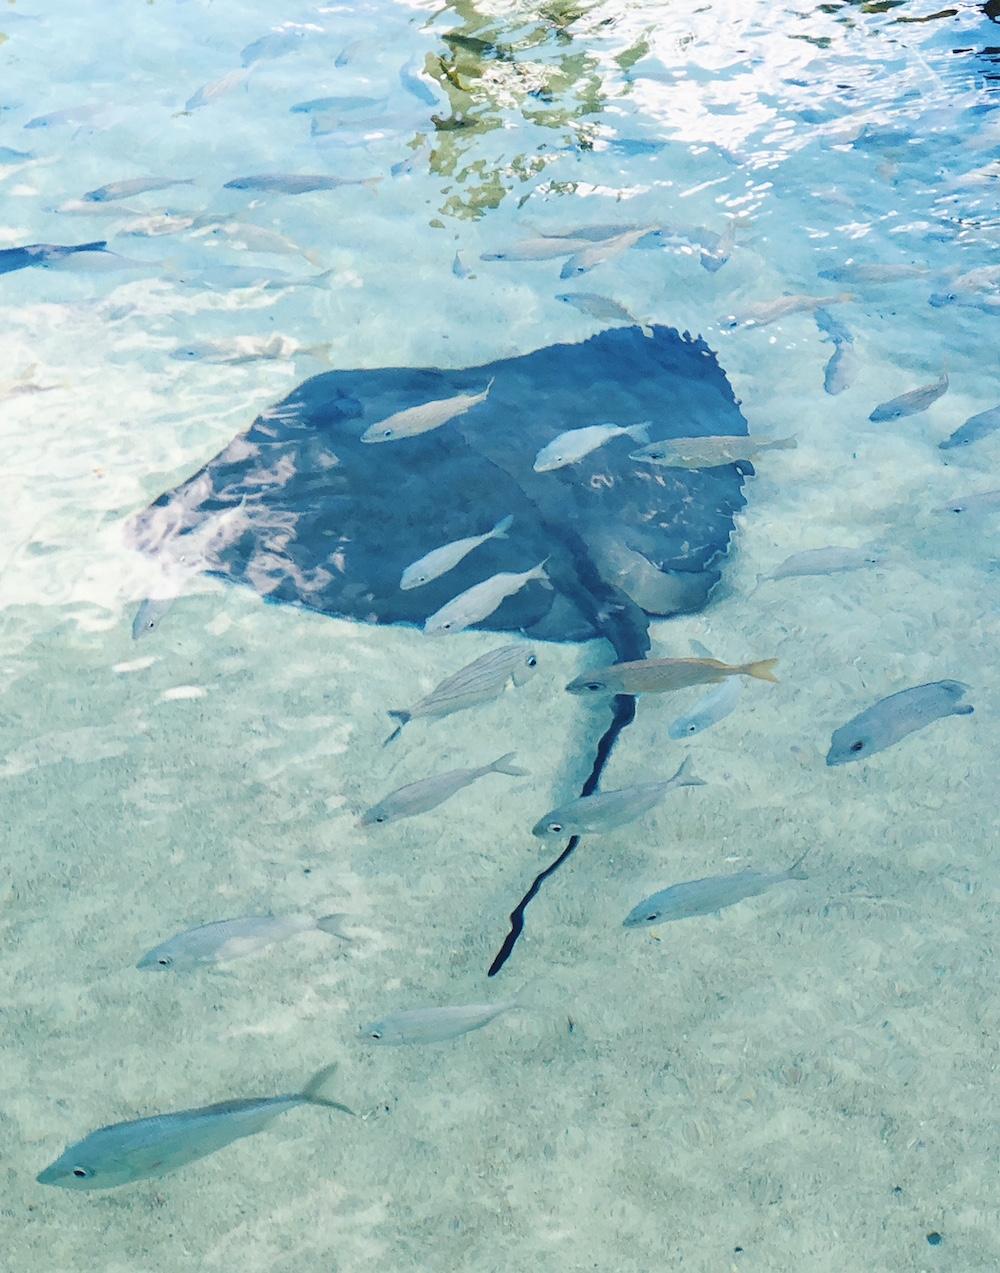 Stingray swimming with fish at Grand Hyatt Baha Mar Bahamas animal sanctuary